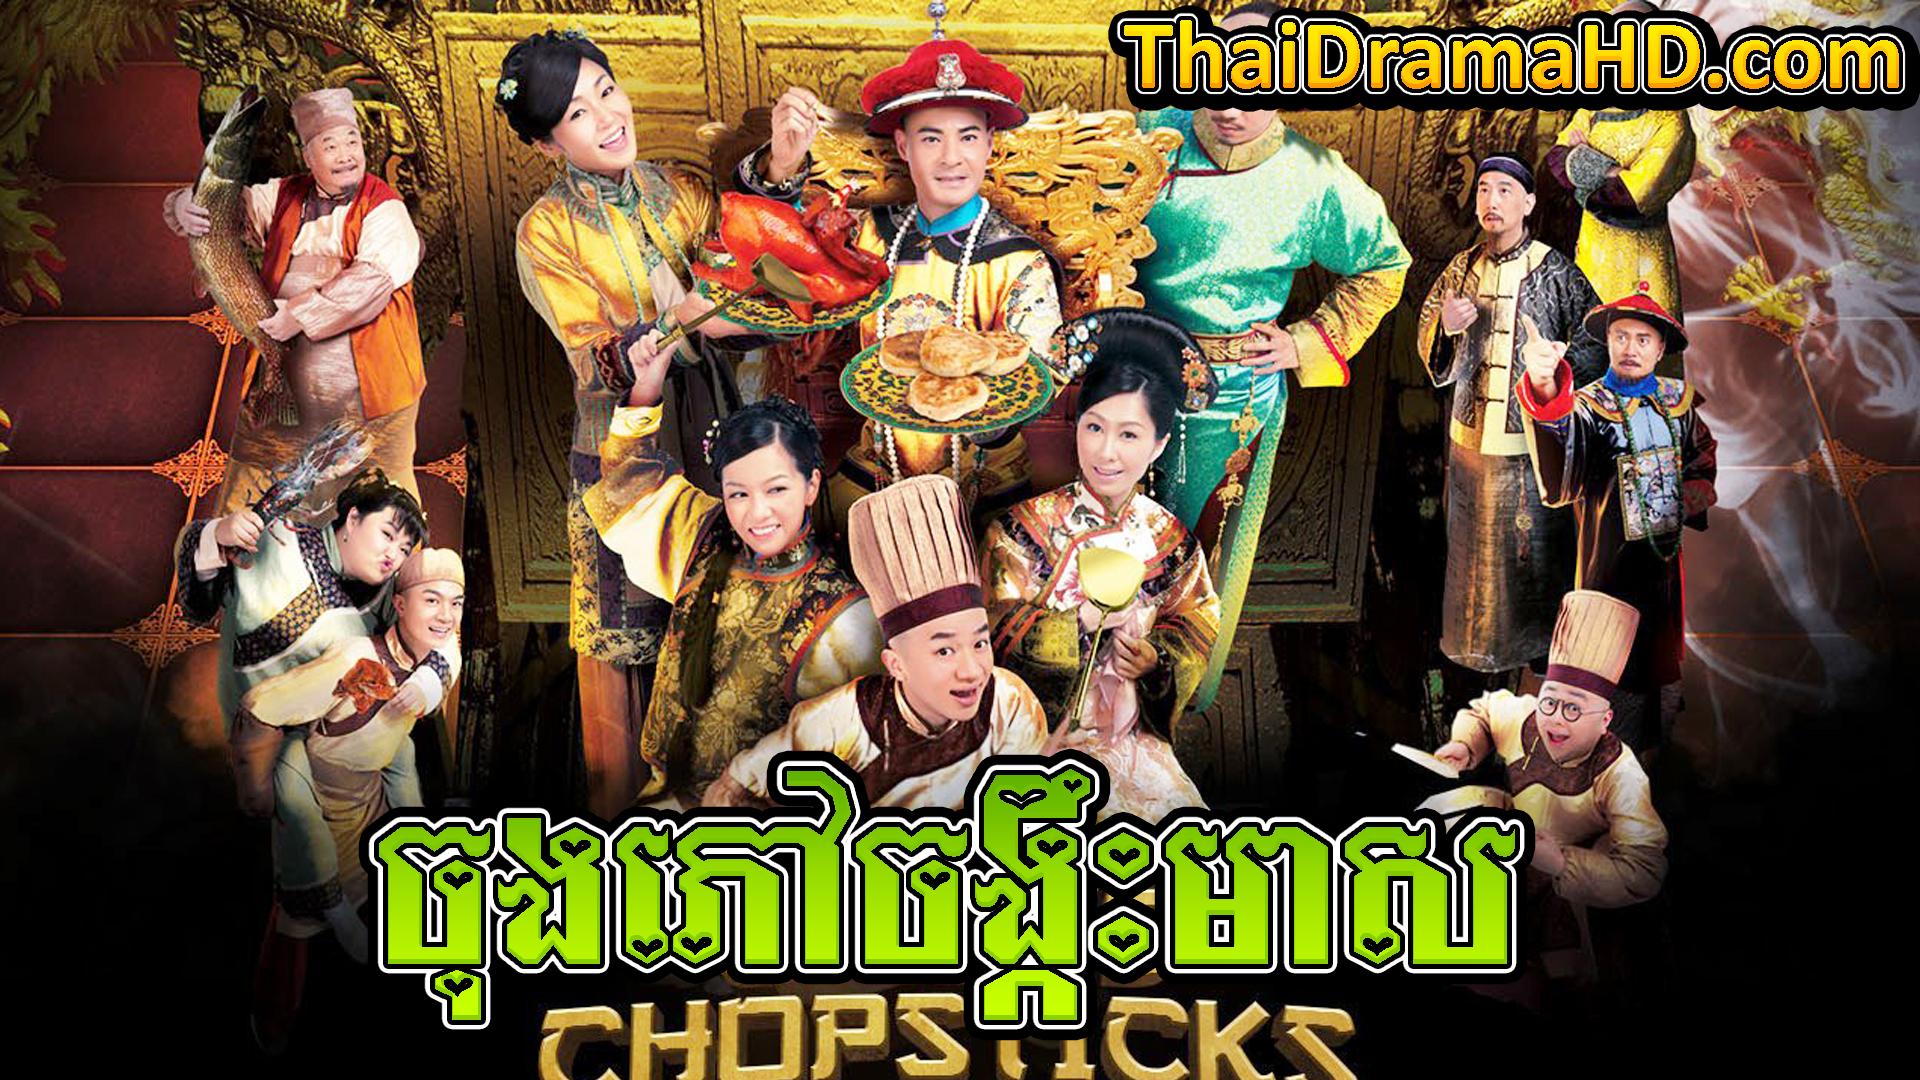 Chongphov Changkeus Meas   Thai Drama   Khmer Movie   Phumikhmer   movie-khmer   video4khmer   khmotions   kolabkhmer   khmer drama   ksdrama   cookingtips   roscheat   khmertimeskh   khmerkomsan   phumi7   merlkon   film2us   movie2kh   sweetdrama   khmercitylove   khreplay   tvb cambodia drama   ckh7   srokthai   phumimedia   phumi8   khmer avenue   khmer search   Soyo   khmerfans